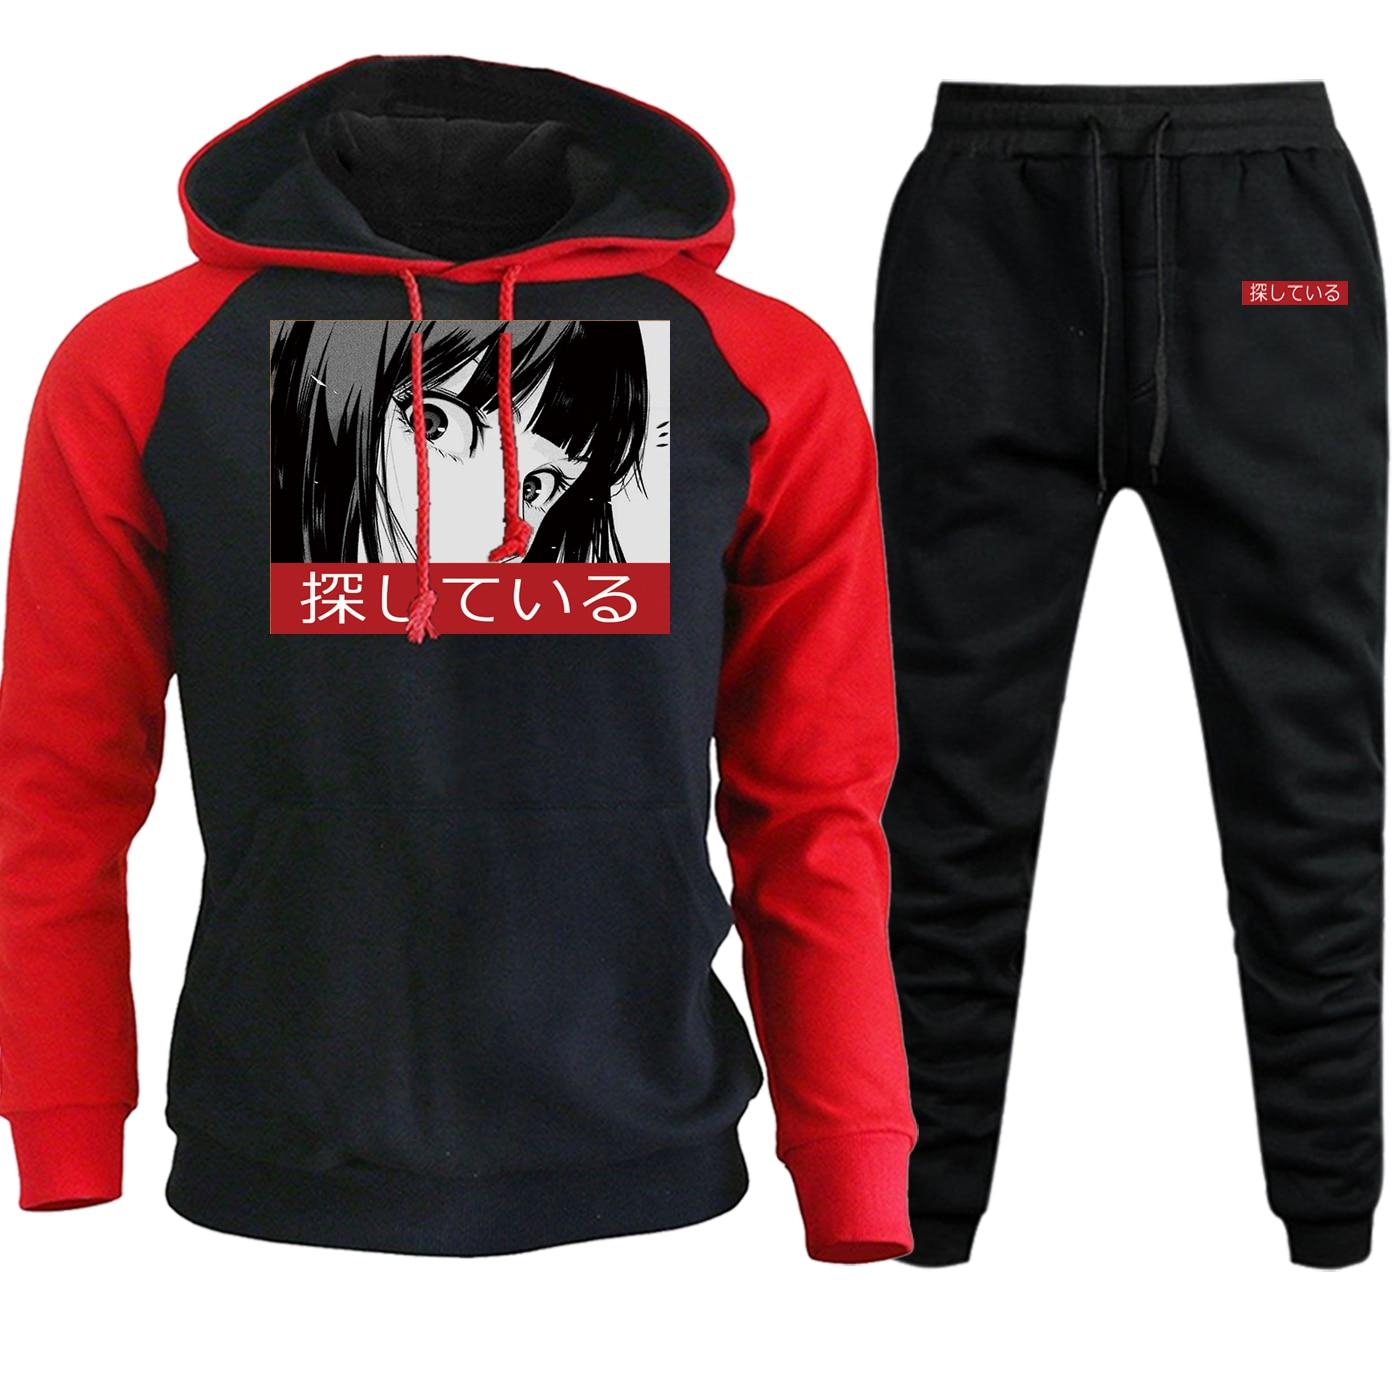 Mens Raglan Hooded New 2019 Autumn Winter Cartoon Anime Sportswear Hoodies Fashion Hip Hop Suit Casual Hoodies+Pants 2 Piece Set